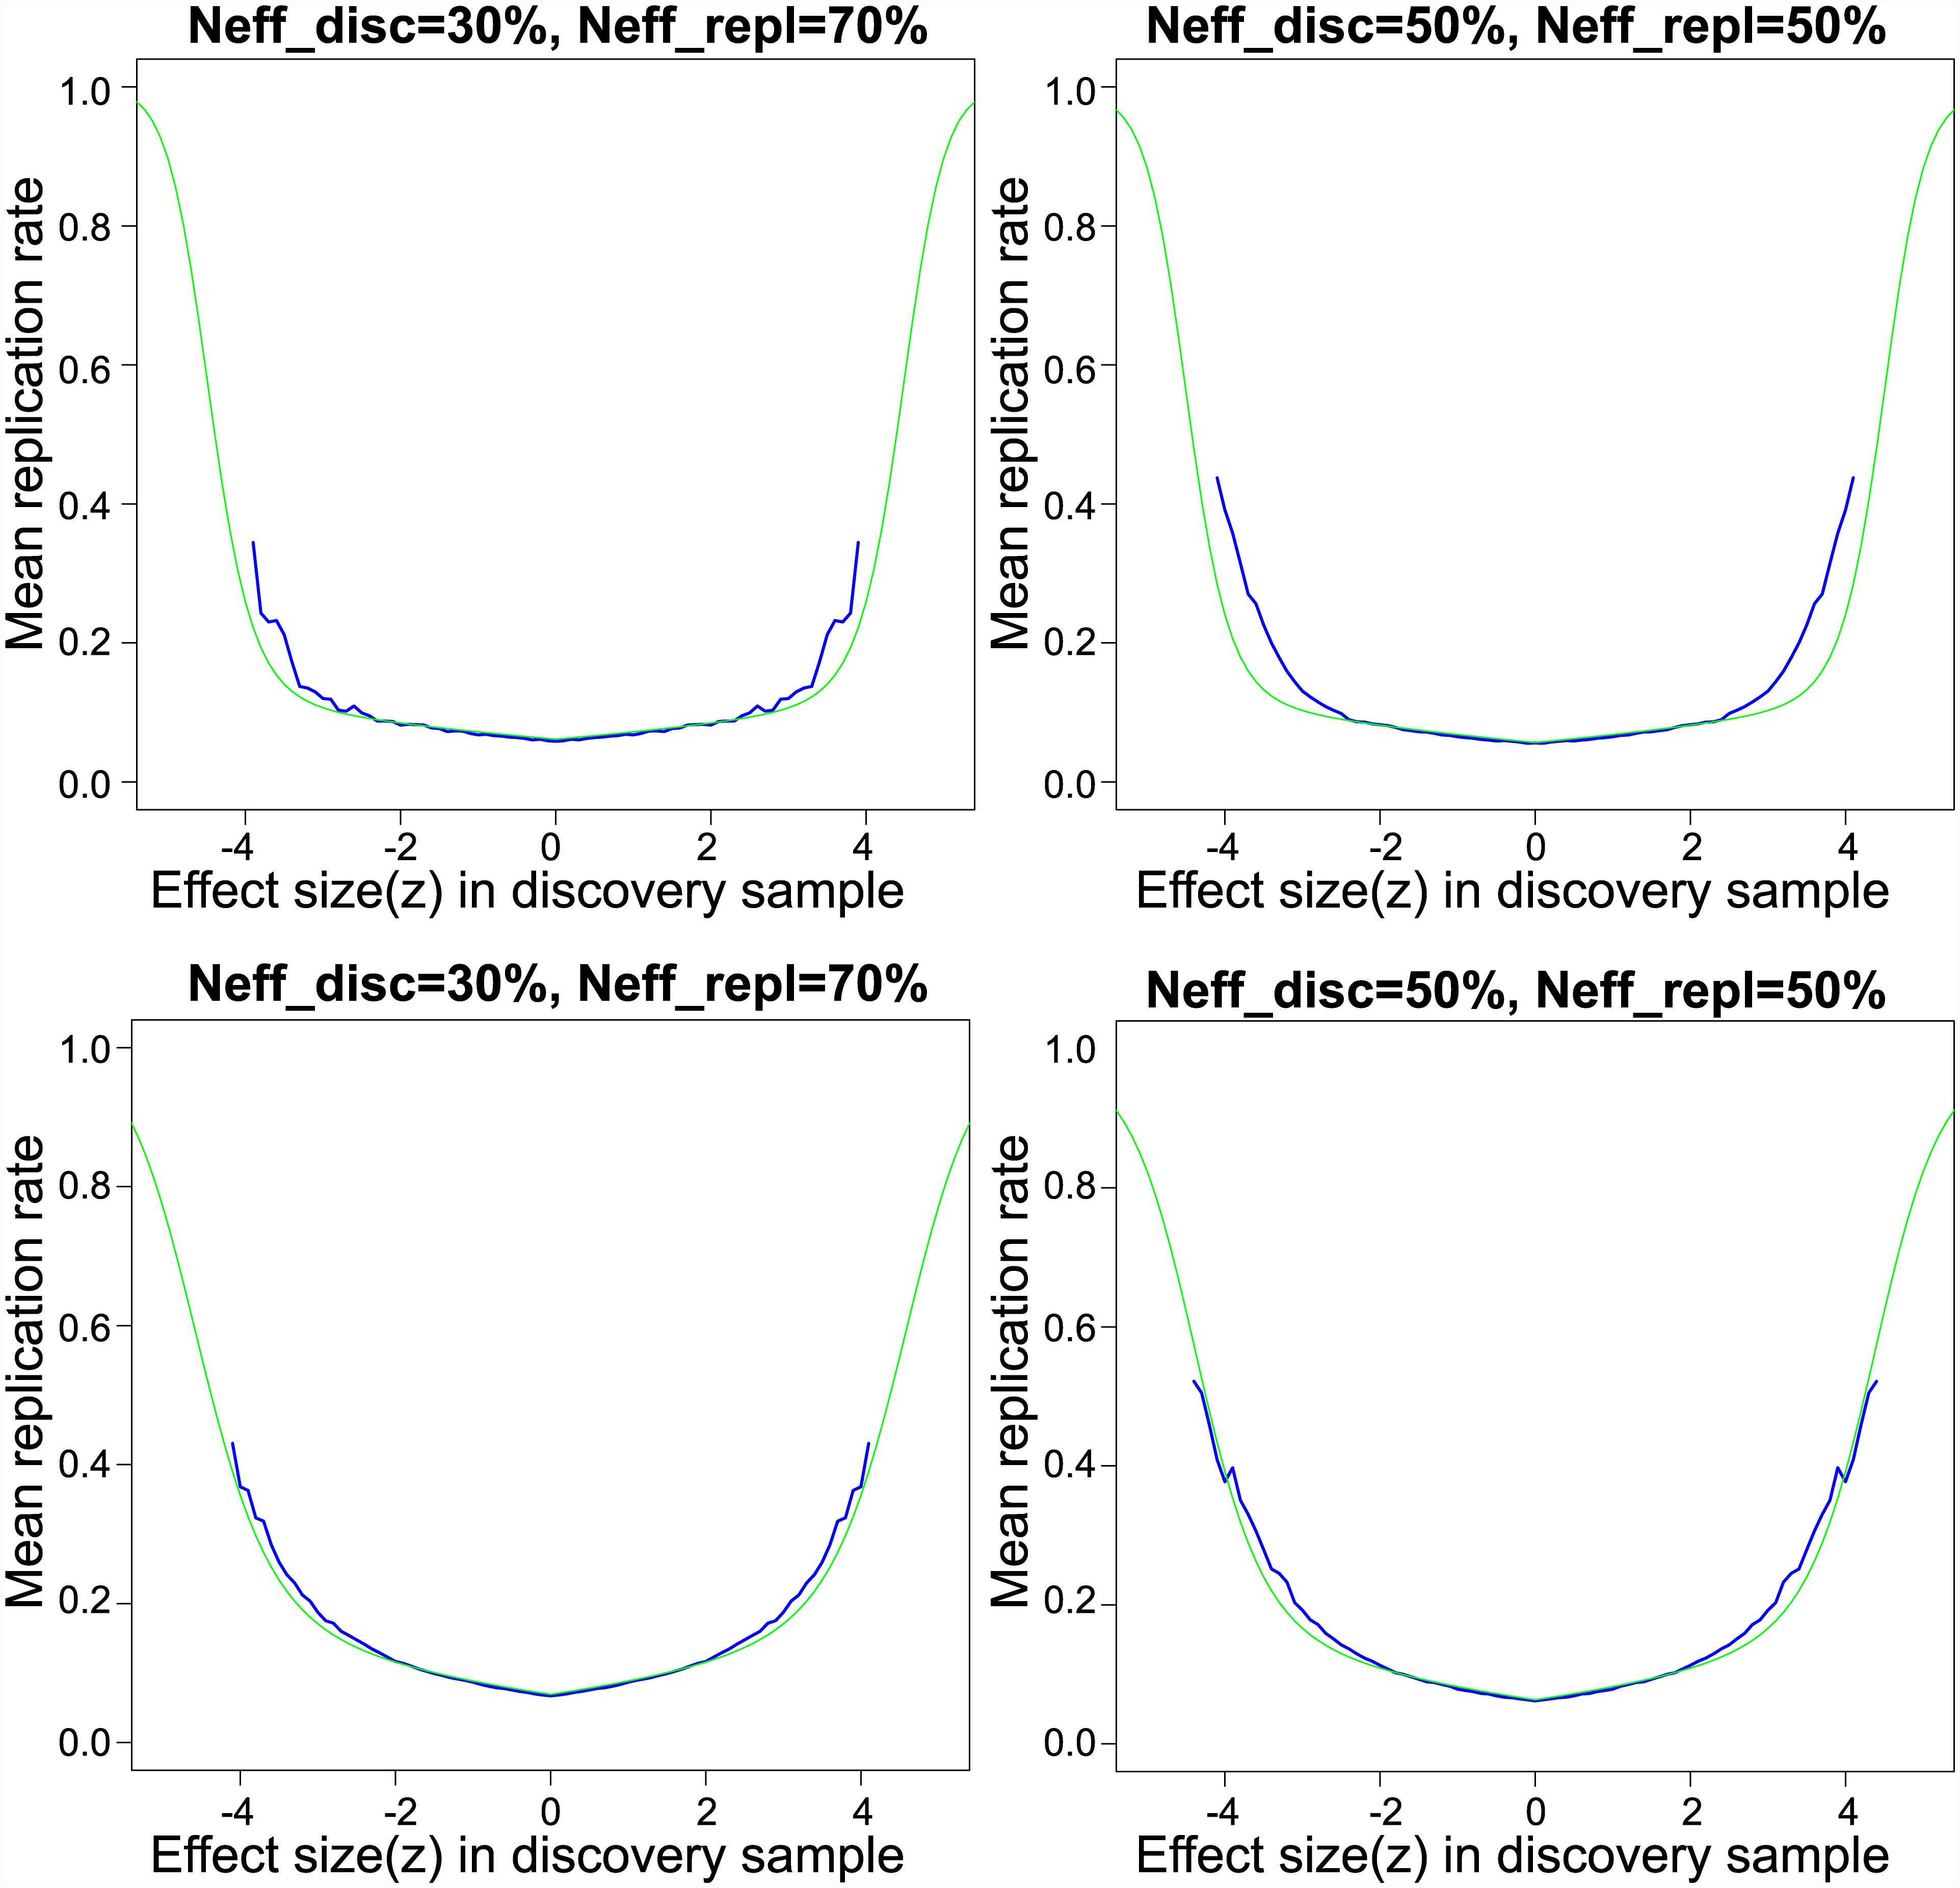 Empirical and model-based replication rates for schizophrenia.